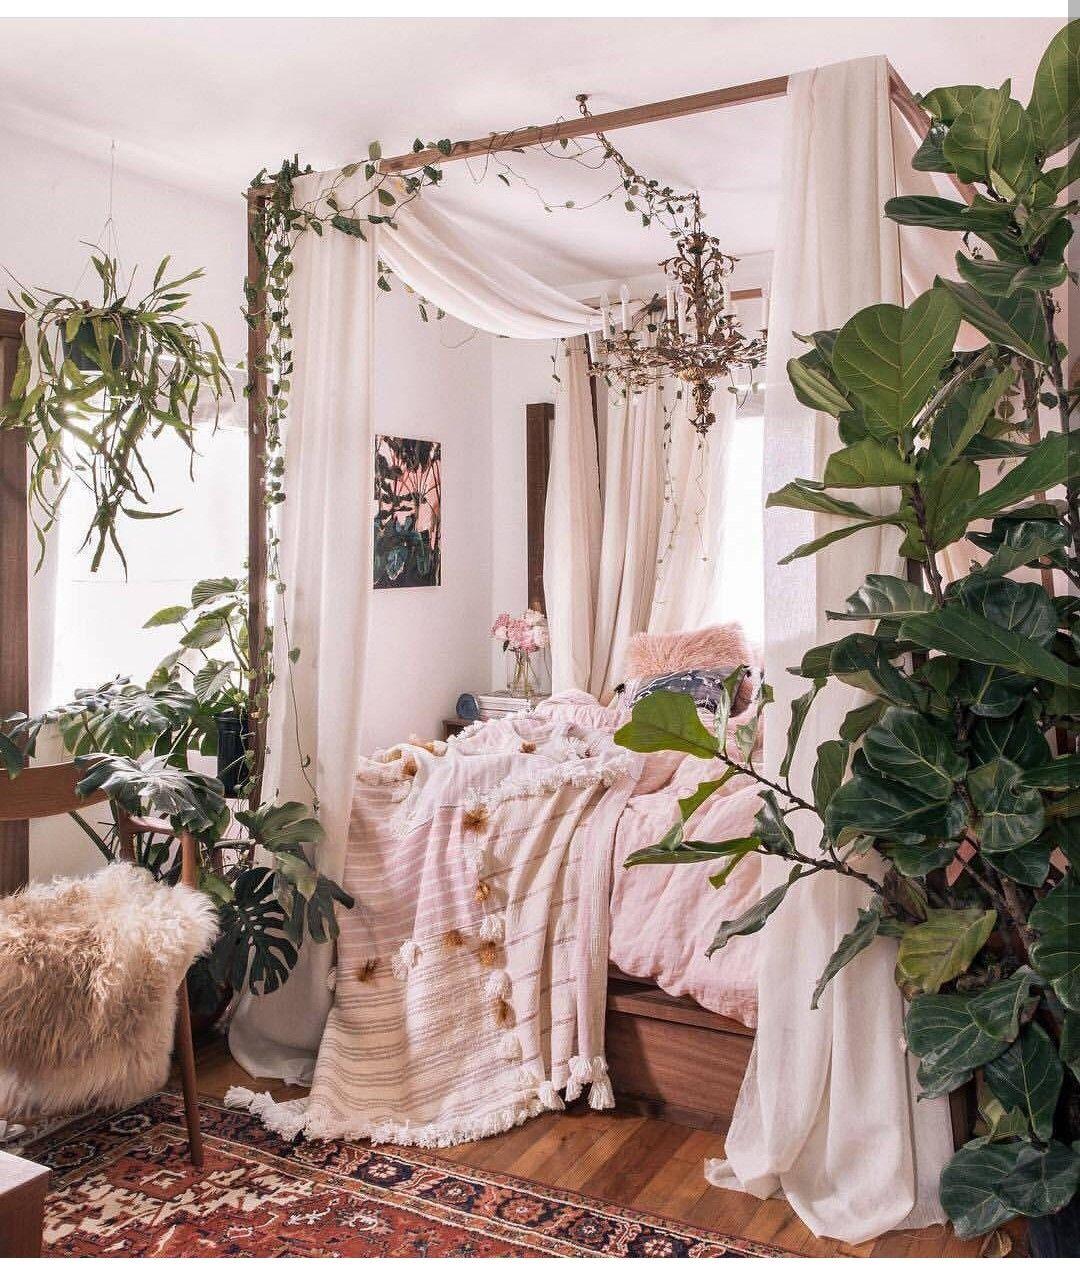 www.wanderfullyrylie.com ✧ Pinterest: wanderfullyrylie ; Instagram: wanderfullyrylie   Haus deko, Himmelbetten, Schlafzimmer deko